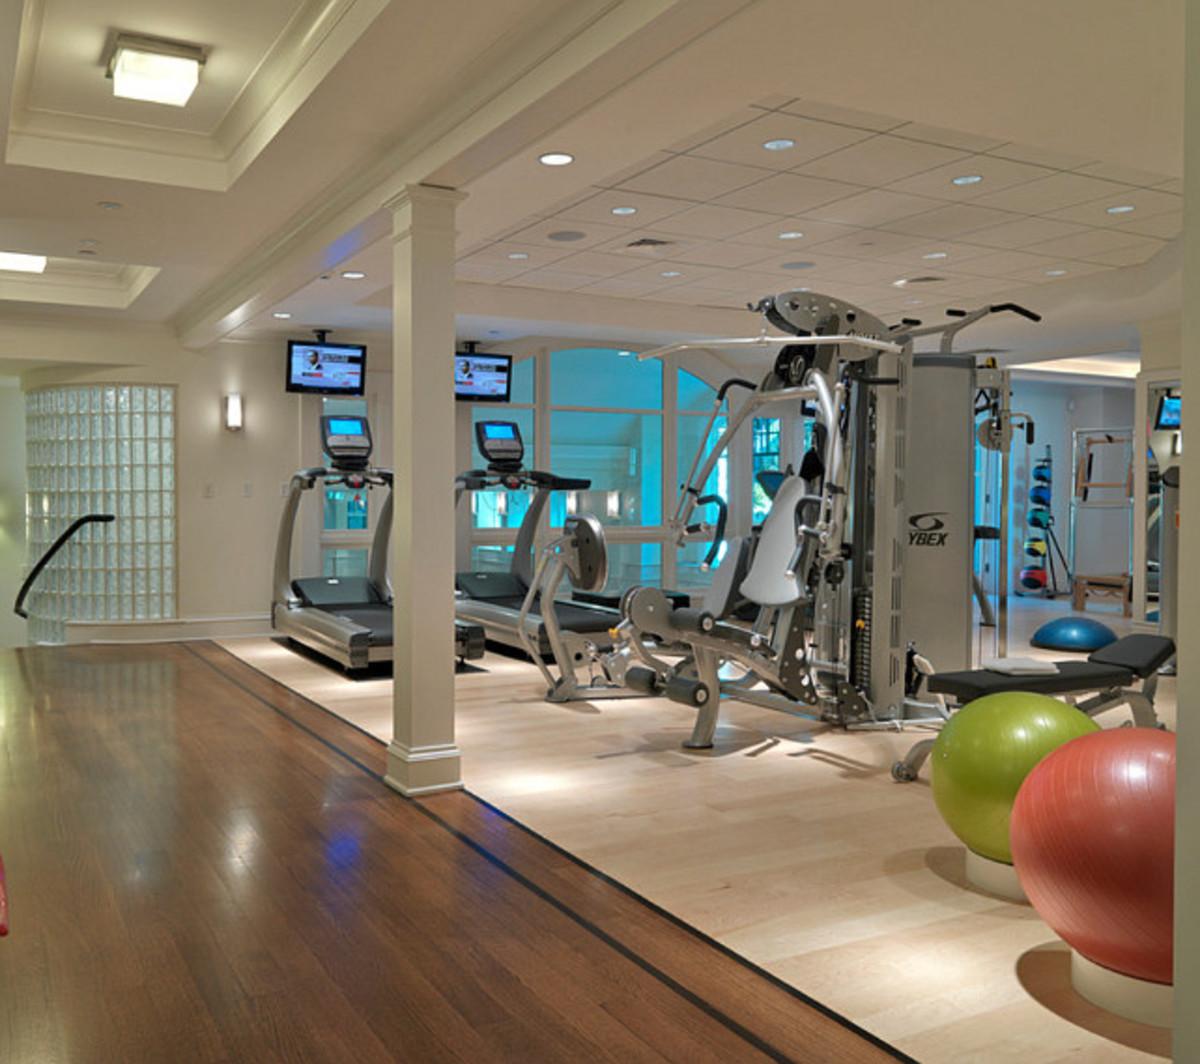 Light Dark and Medium Wood Tones in a fitness room = Surprised Elegance